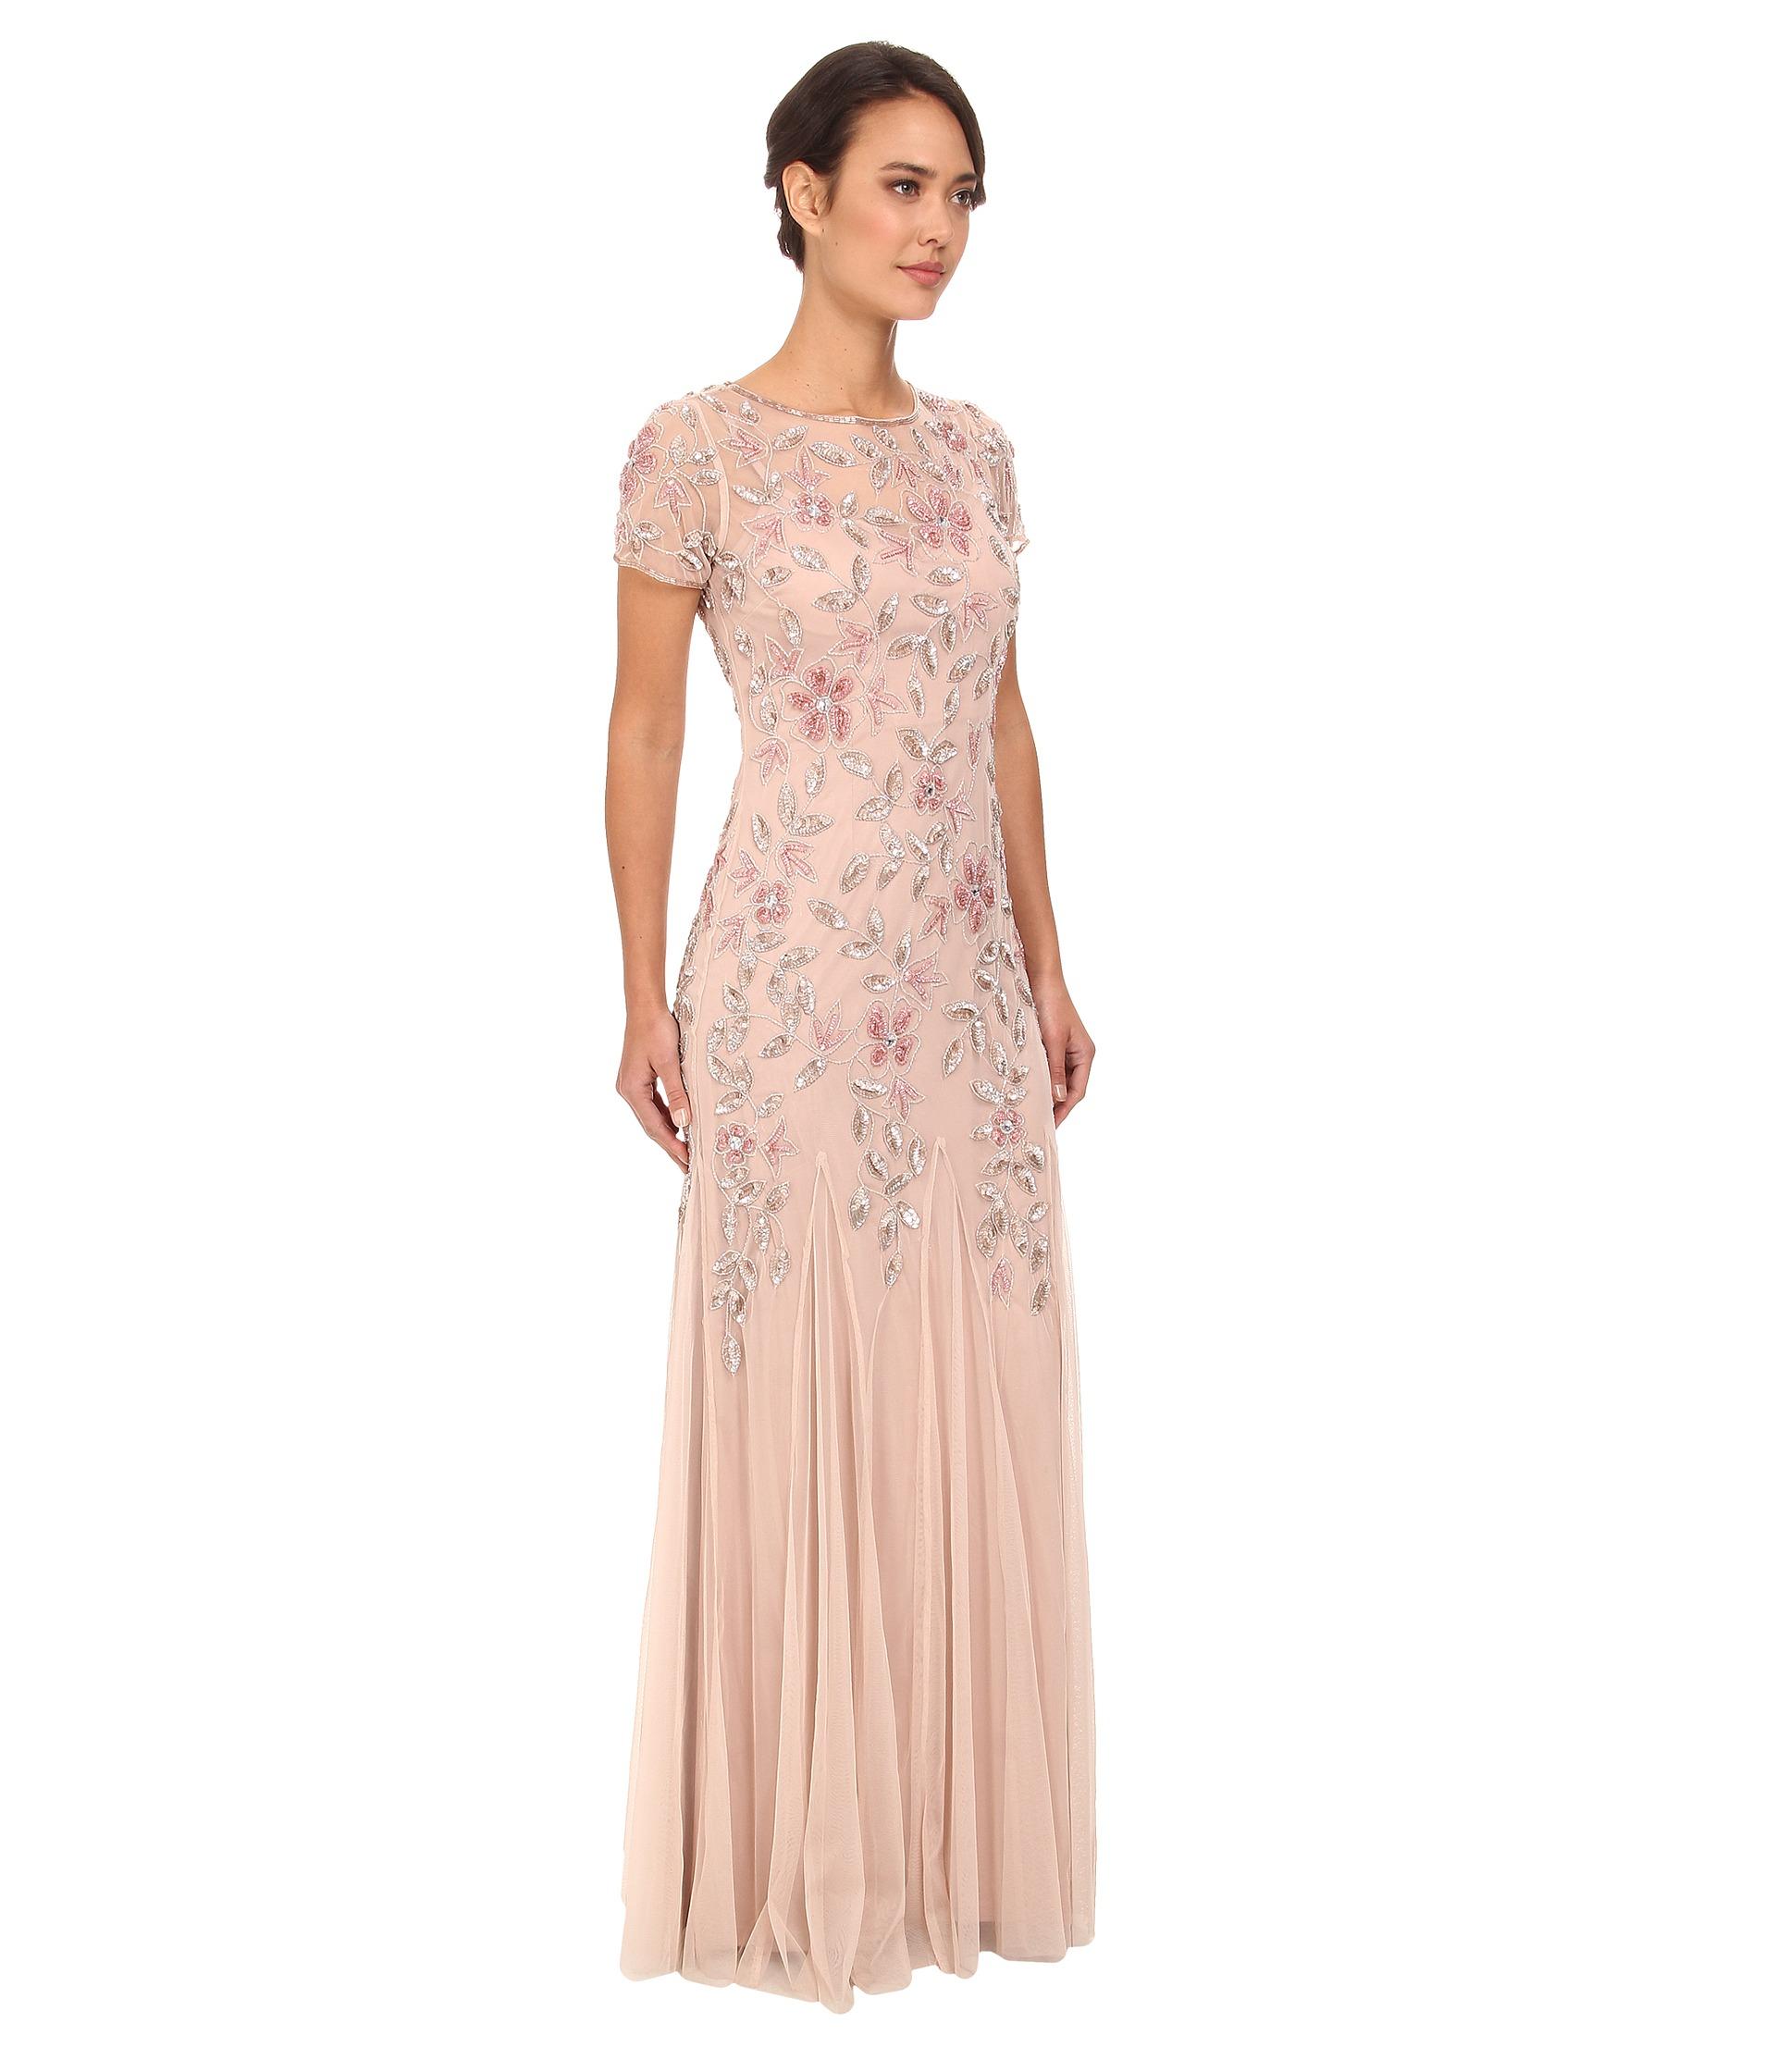 65538da394ed Women's Pink Floral Beaded Godet Gown